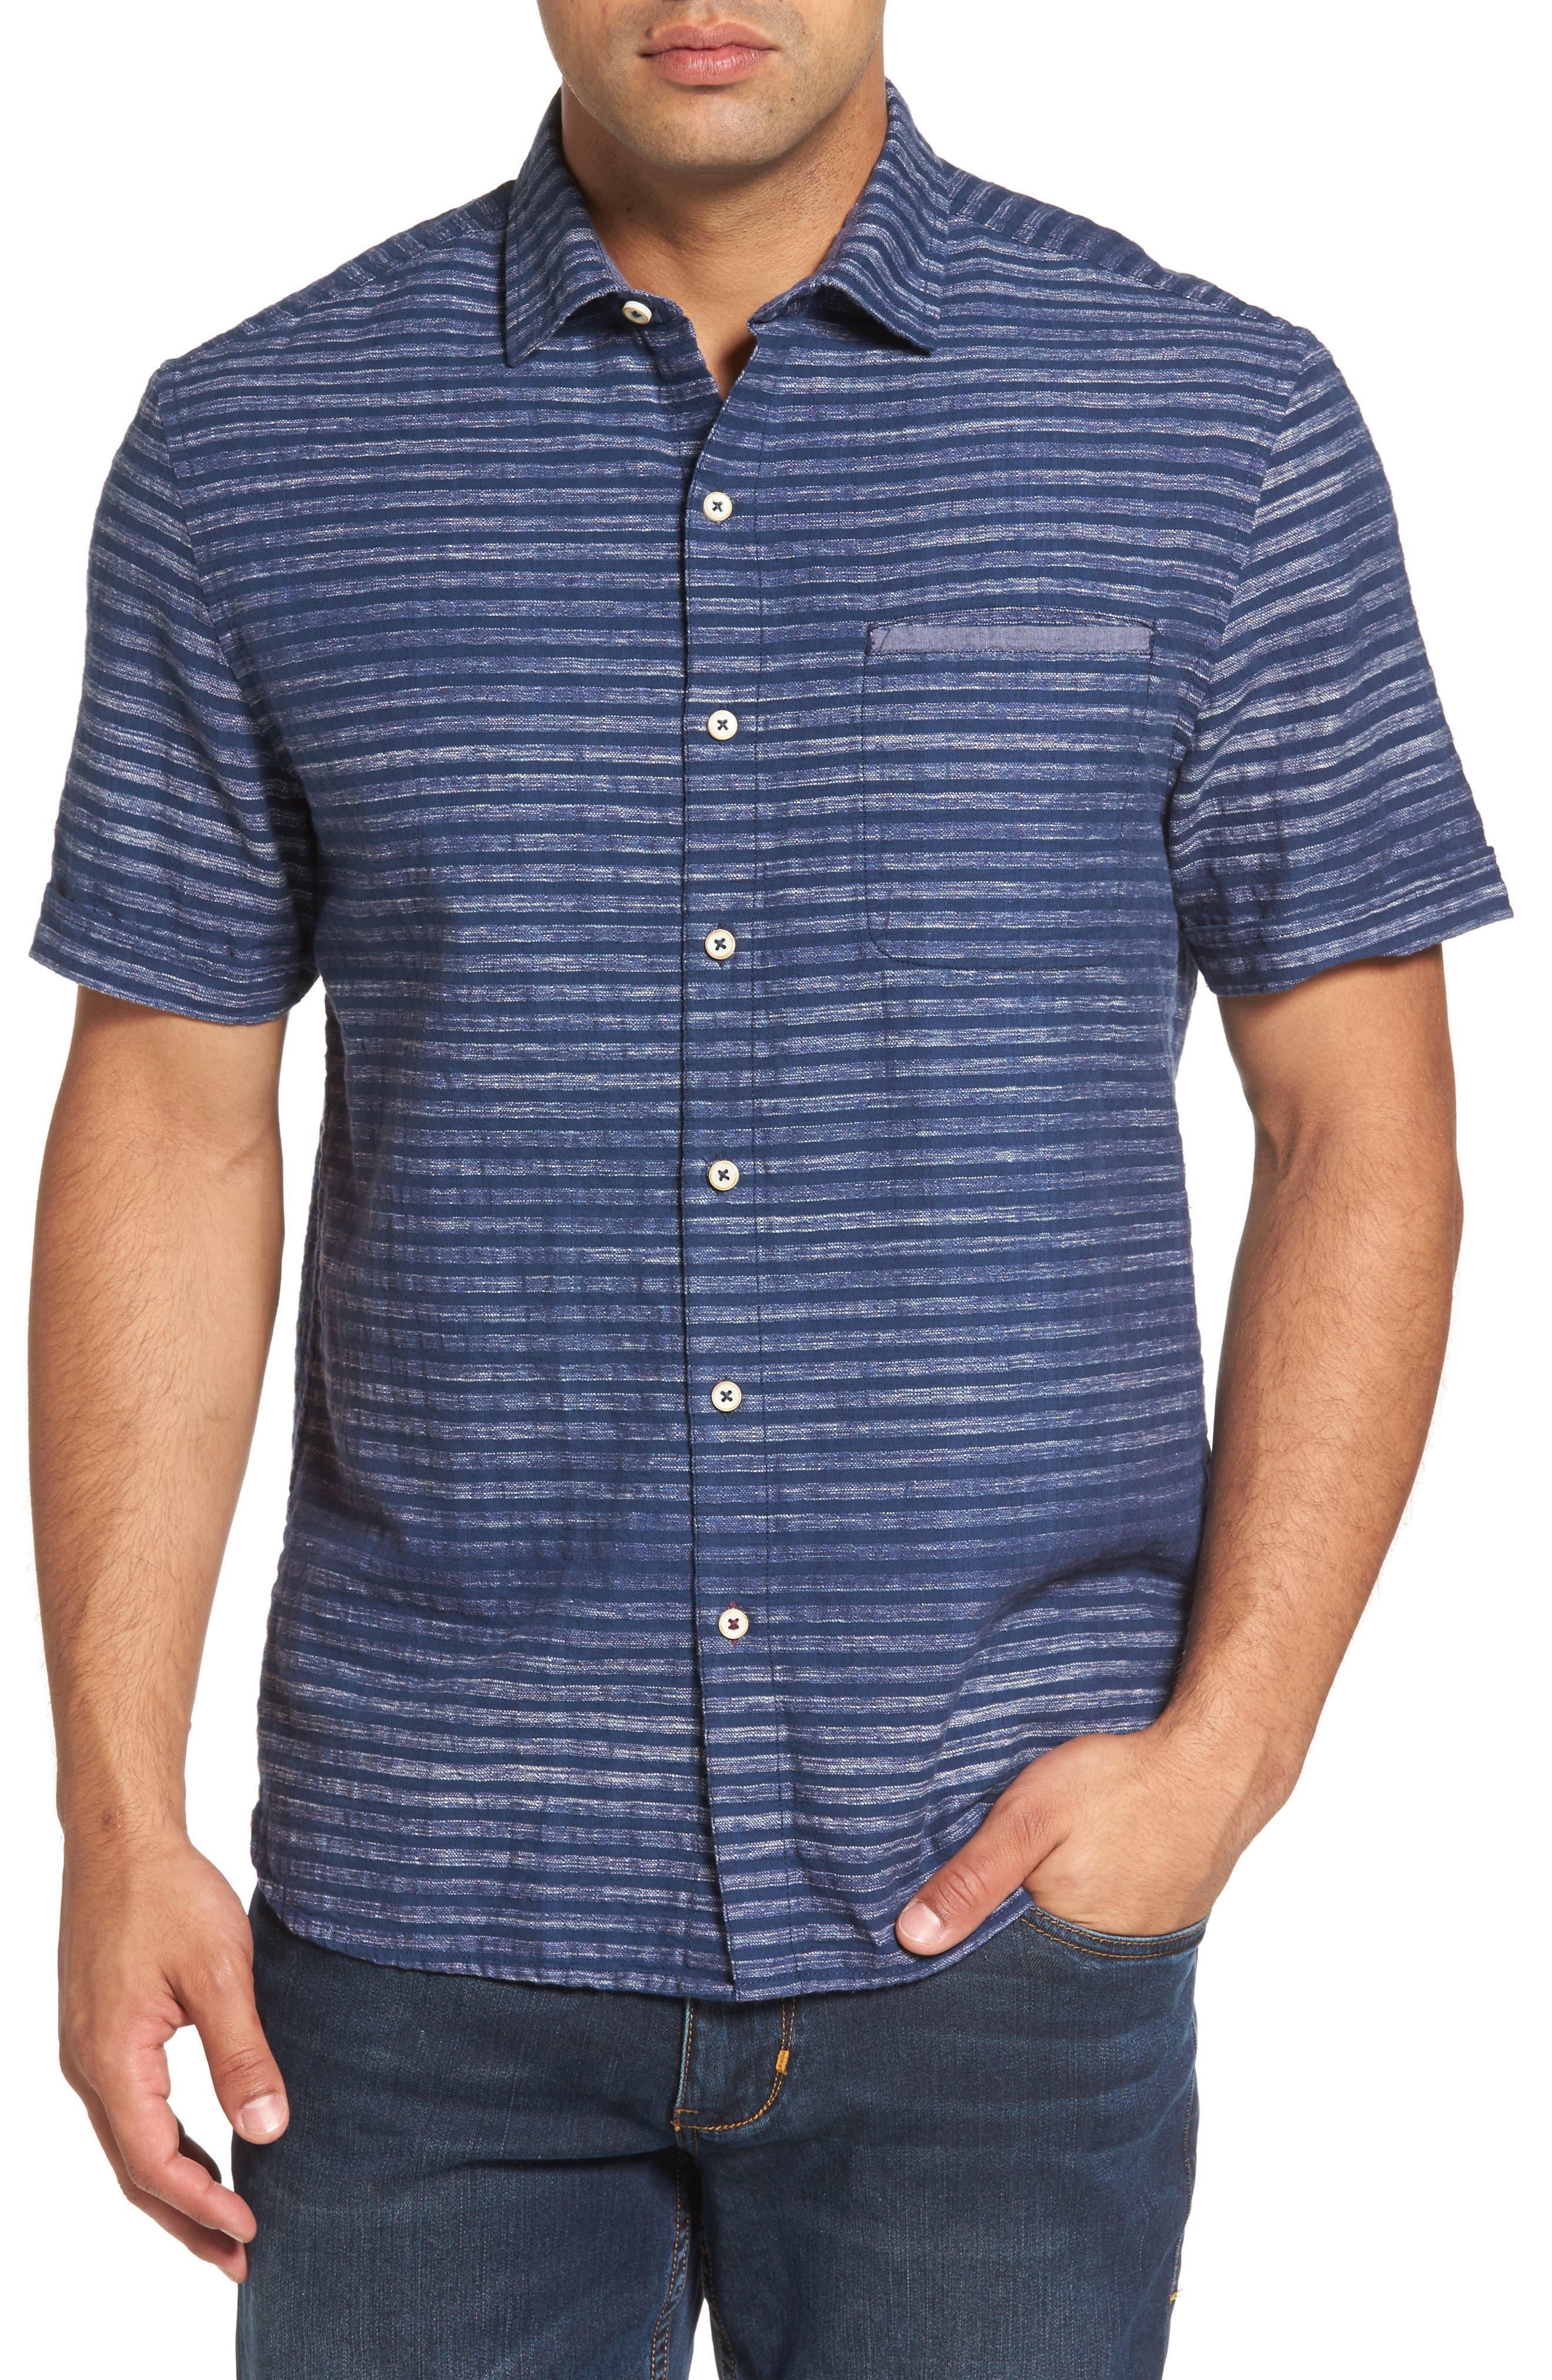 Main Image - Tommy Bahama Seaway Stripe Standard Fit Sport Shirt